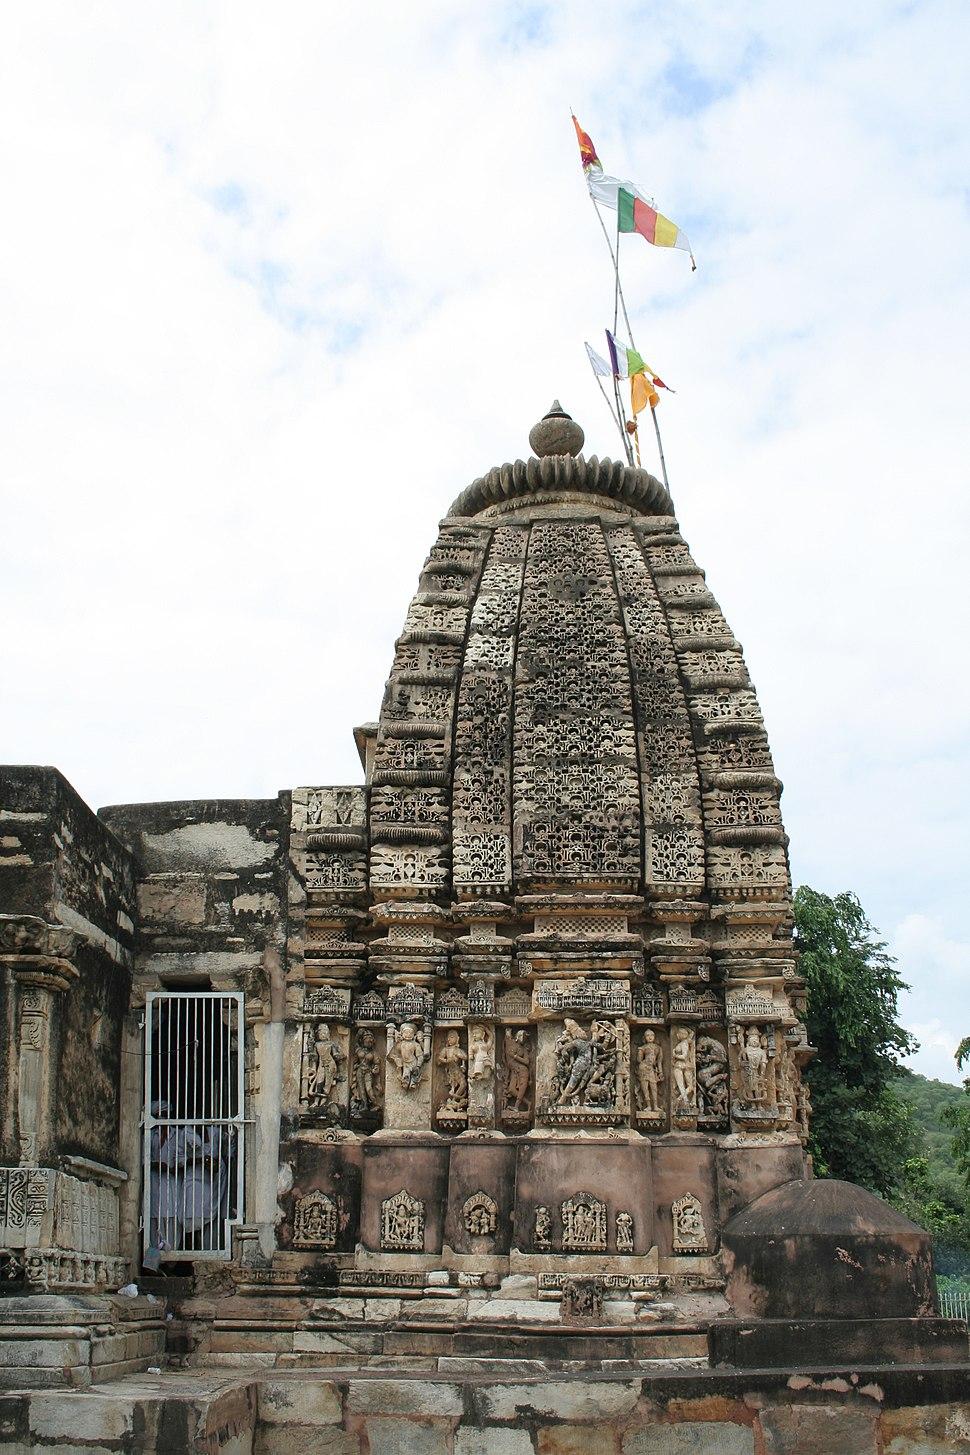 Exterior, Neelkanth temple, Alwar district, Rajasthan, India